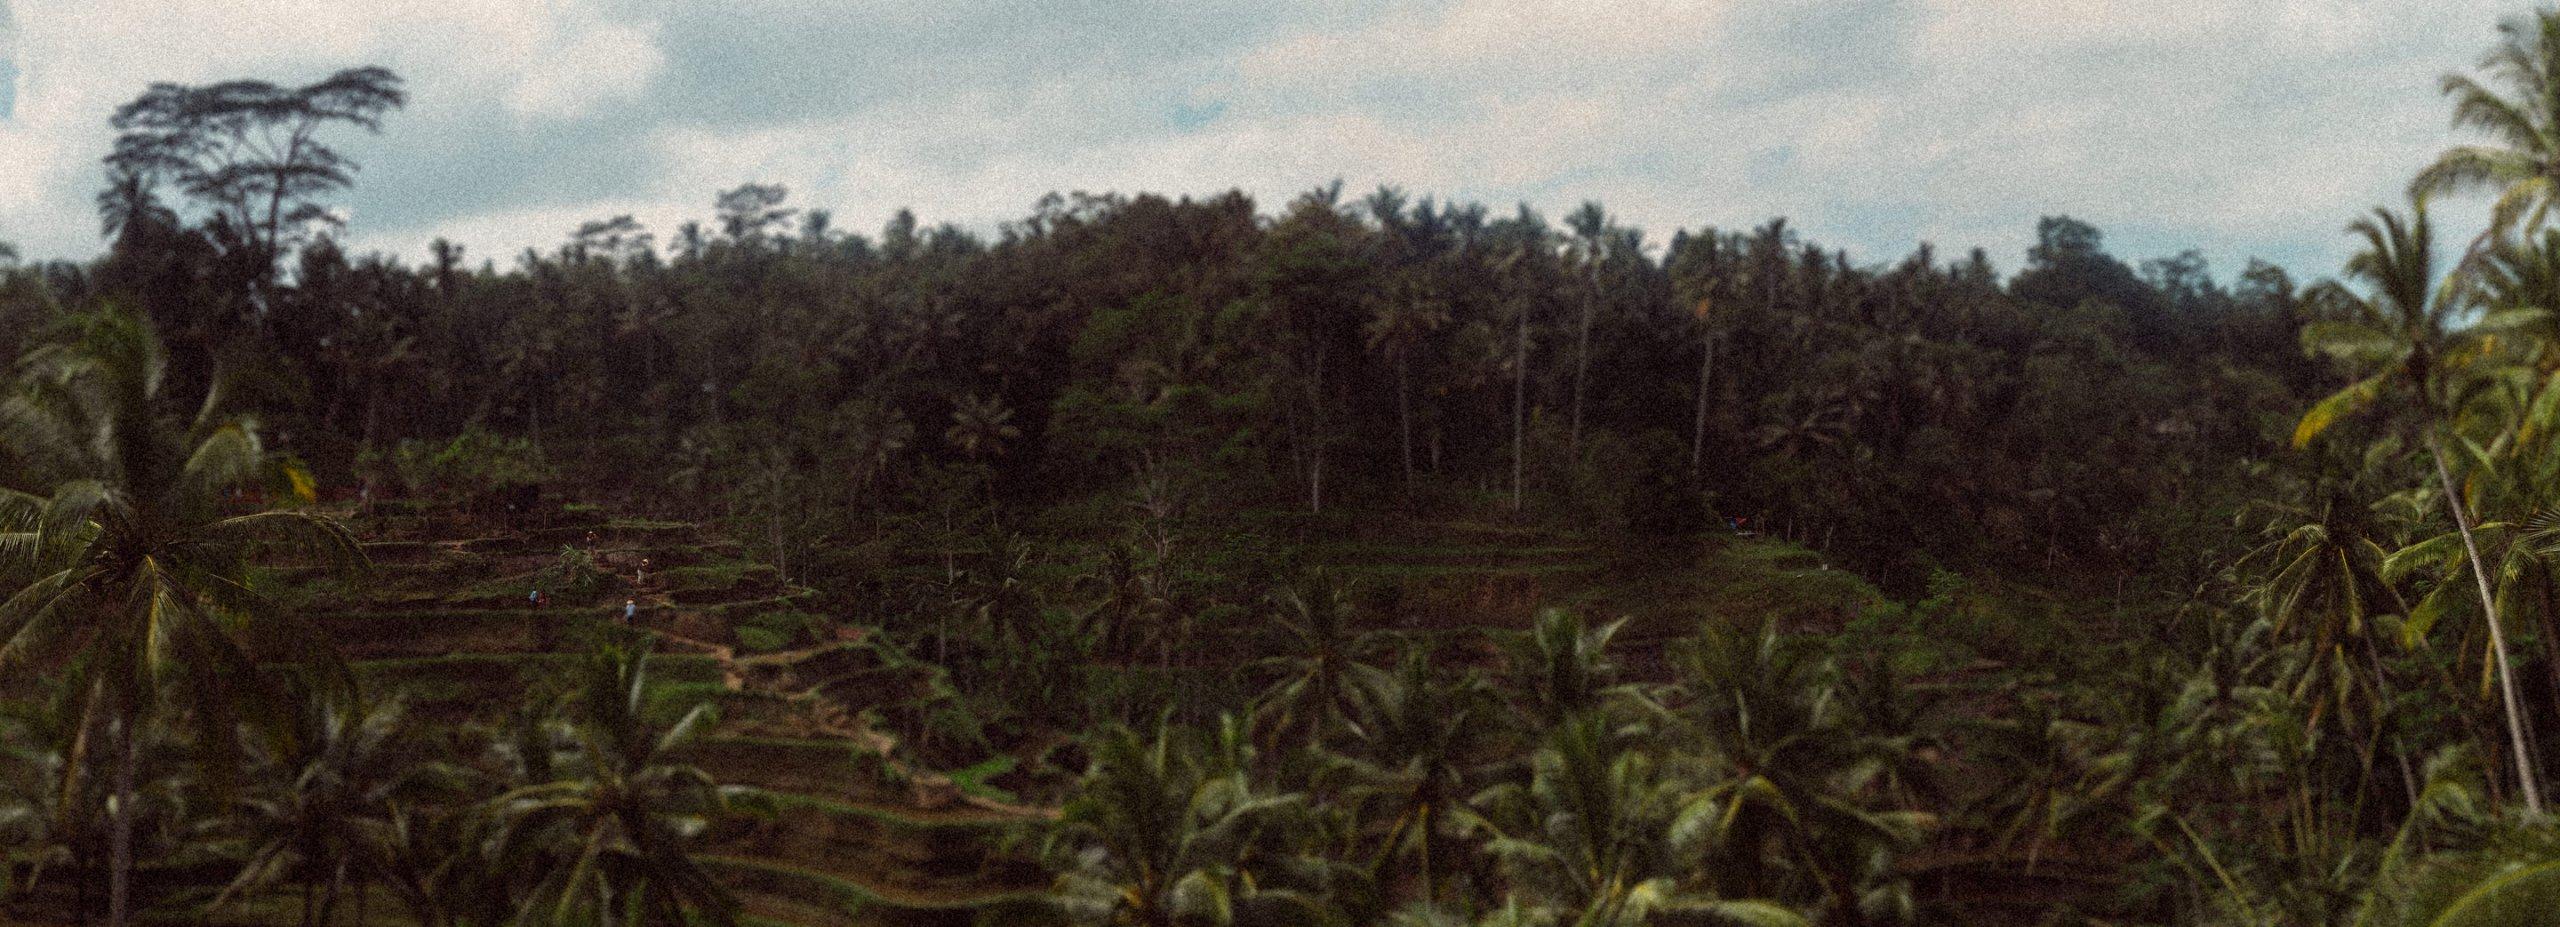 Johannes-Maur-Panorama-Fotografie-Indonesia_6